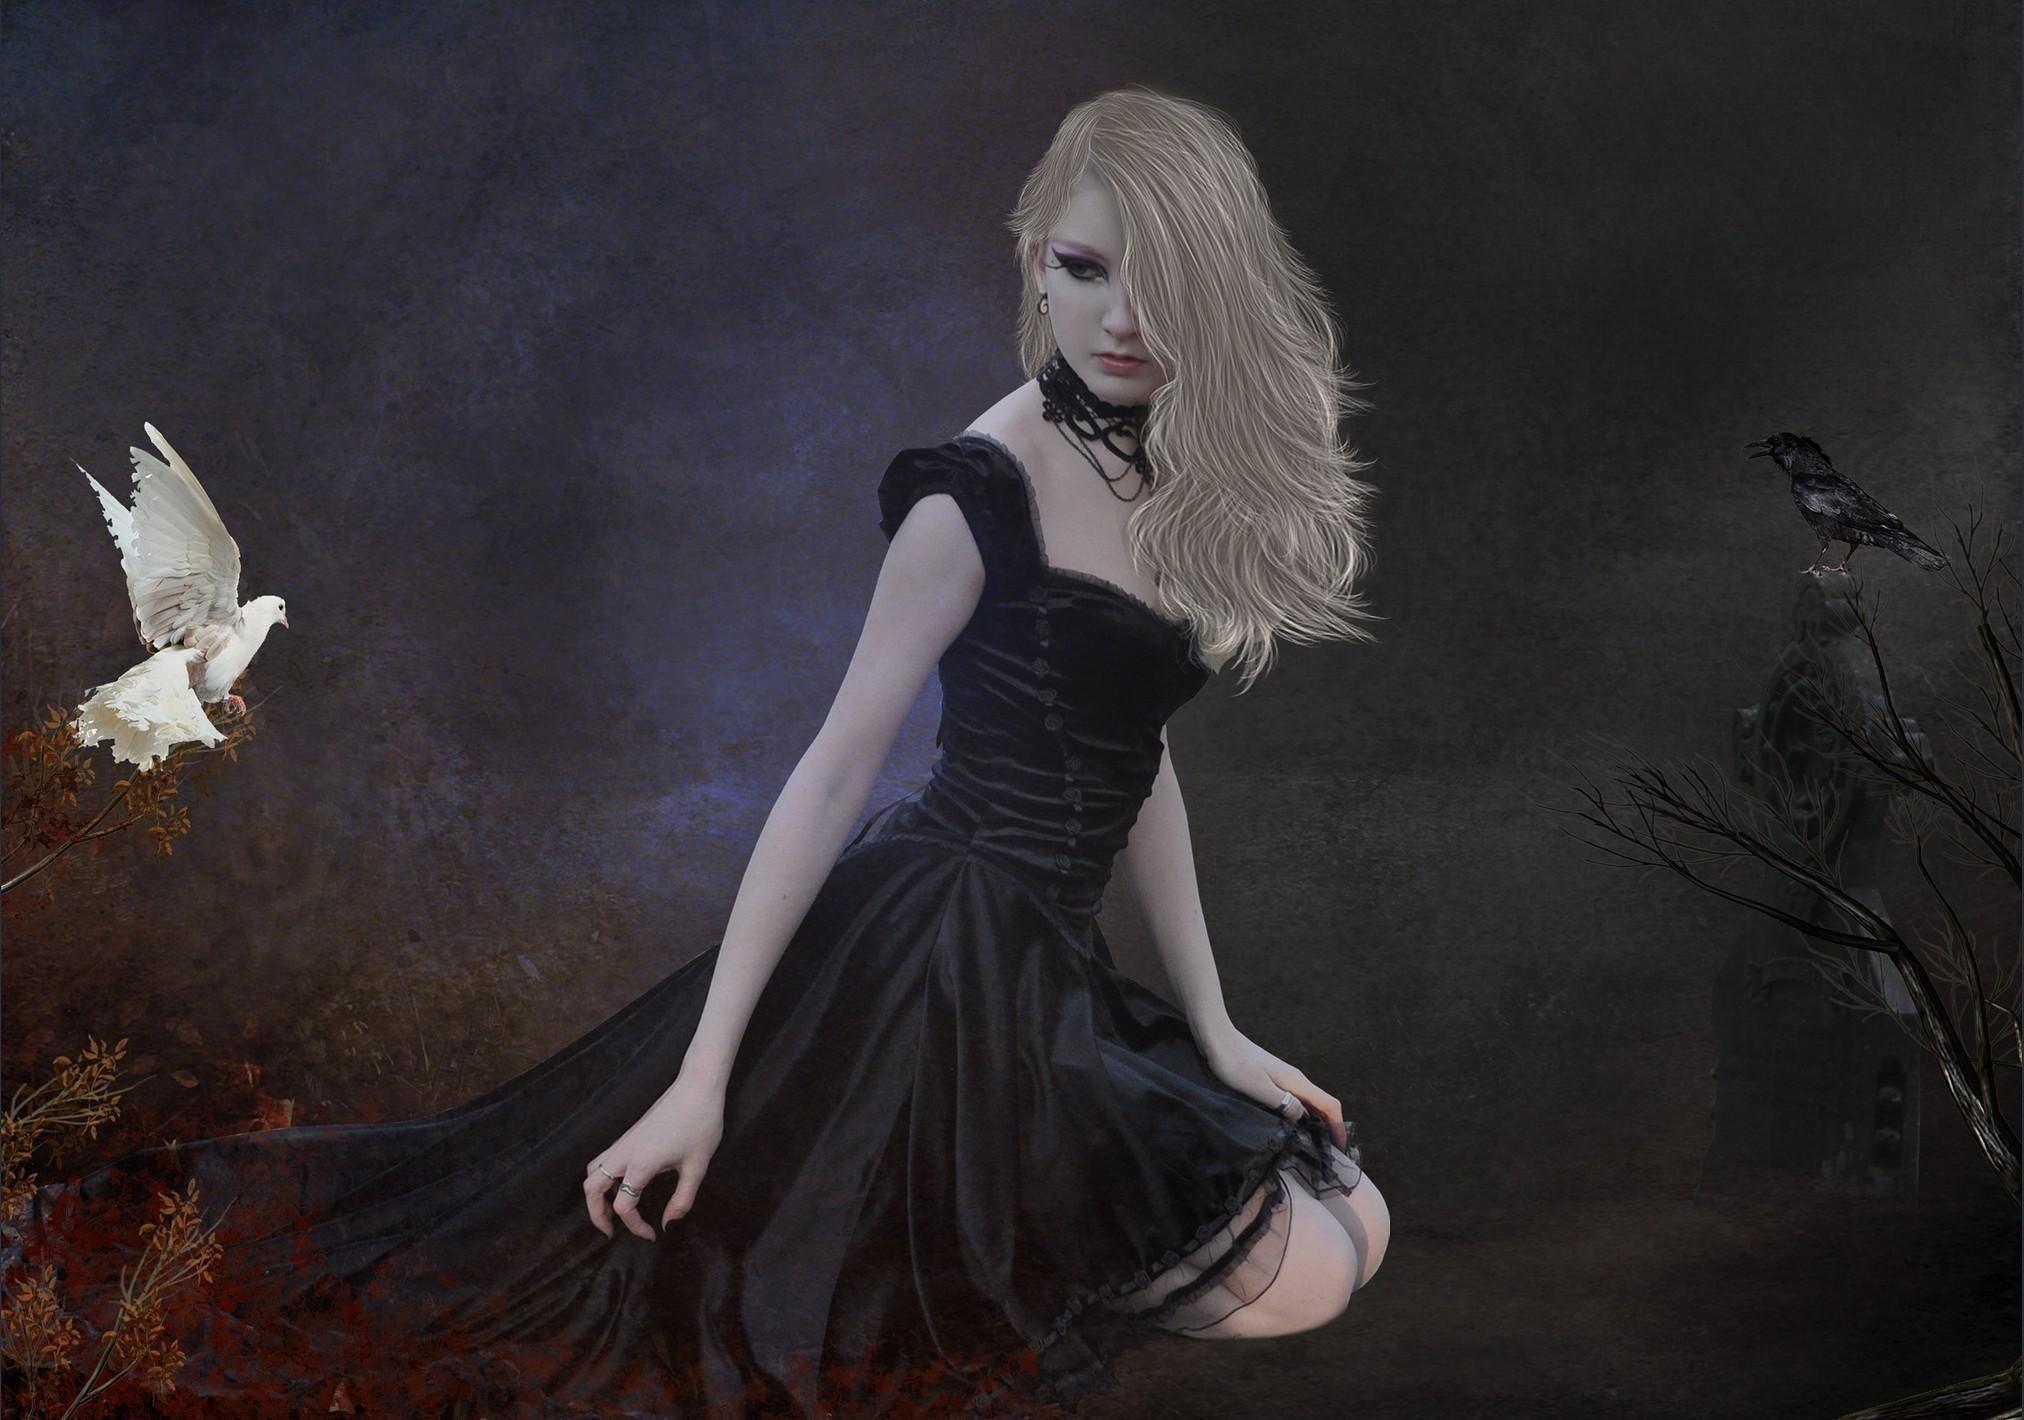 Goth Girl With Bird wallpaper thumb